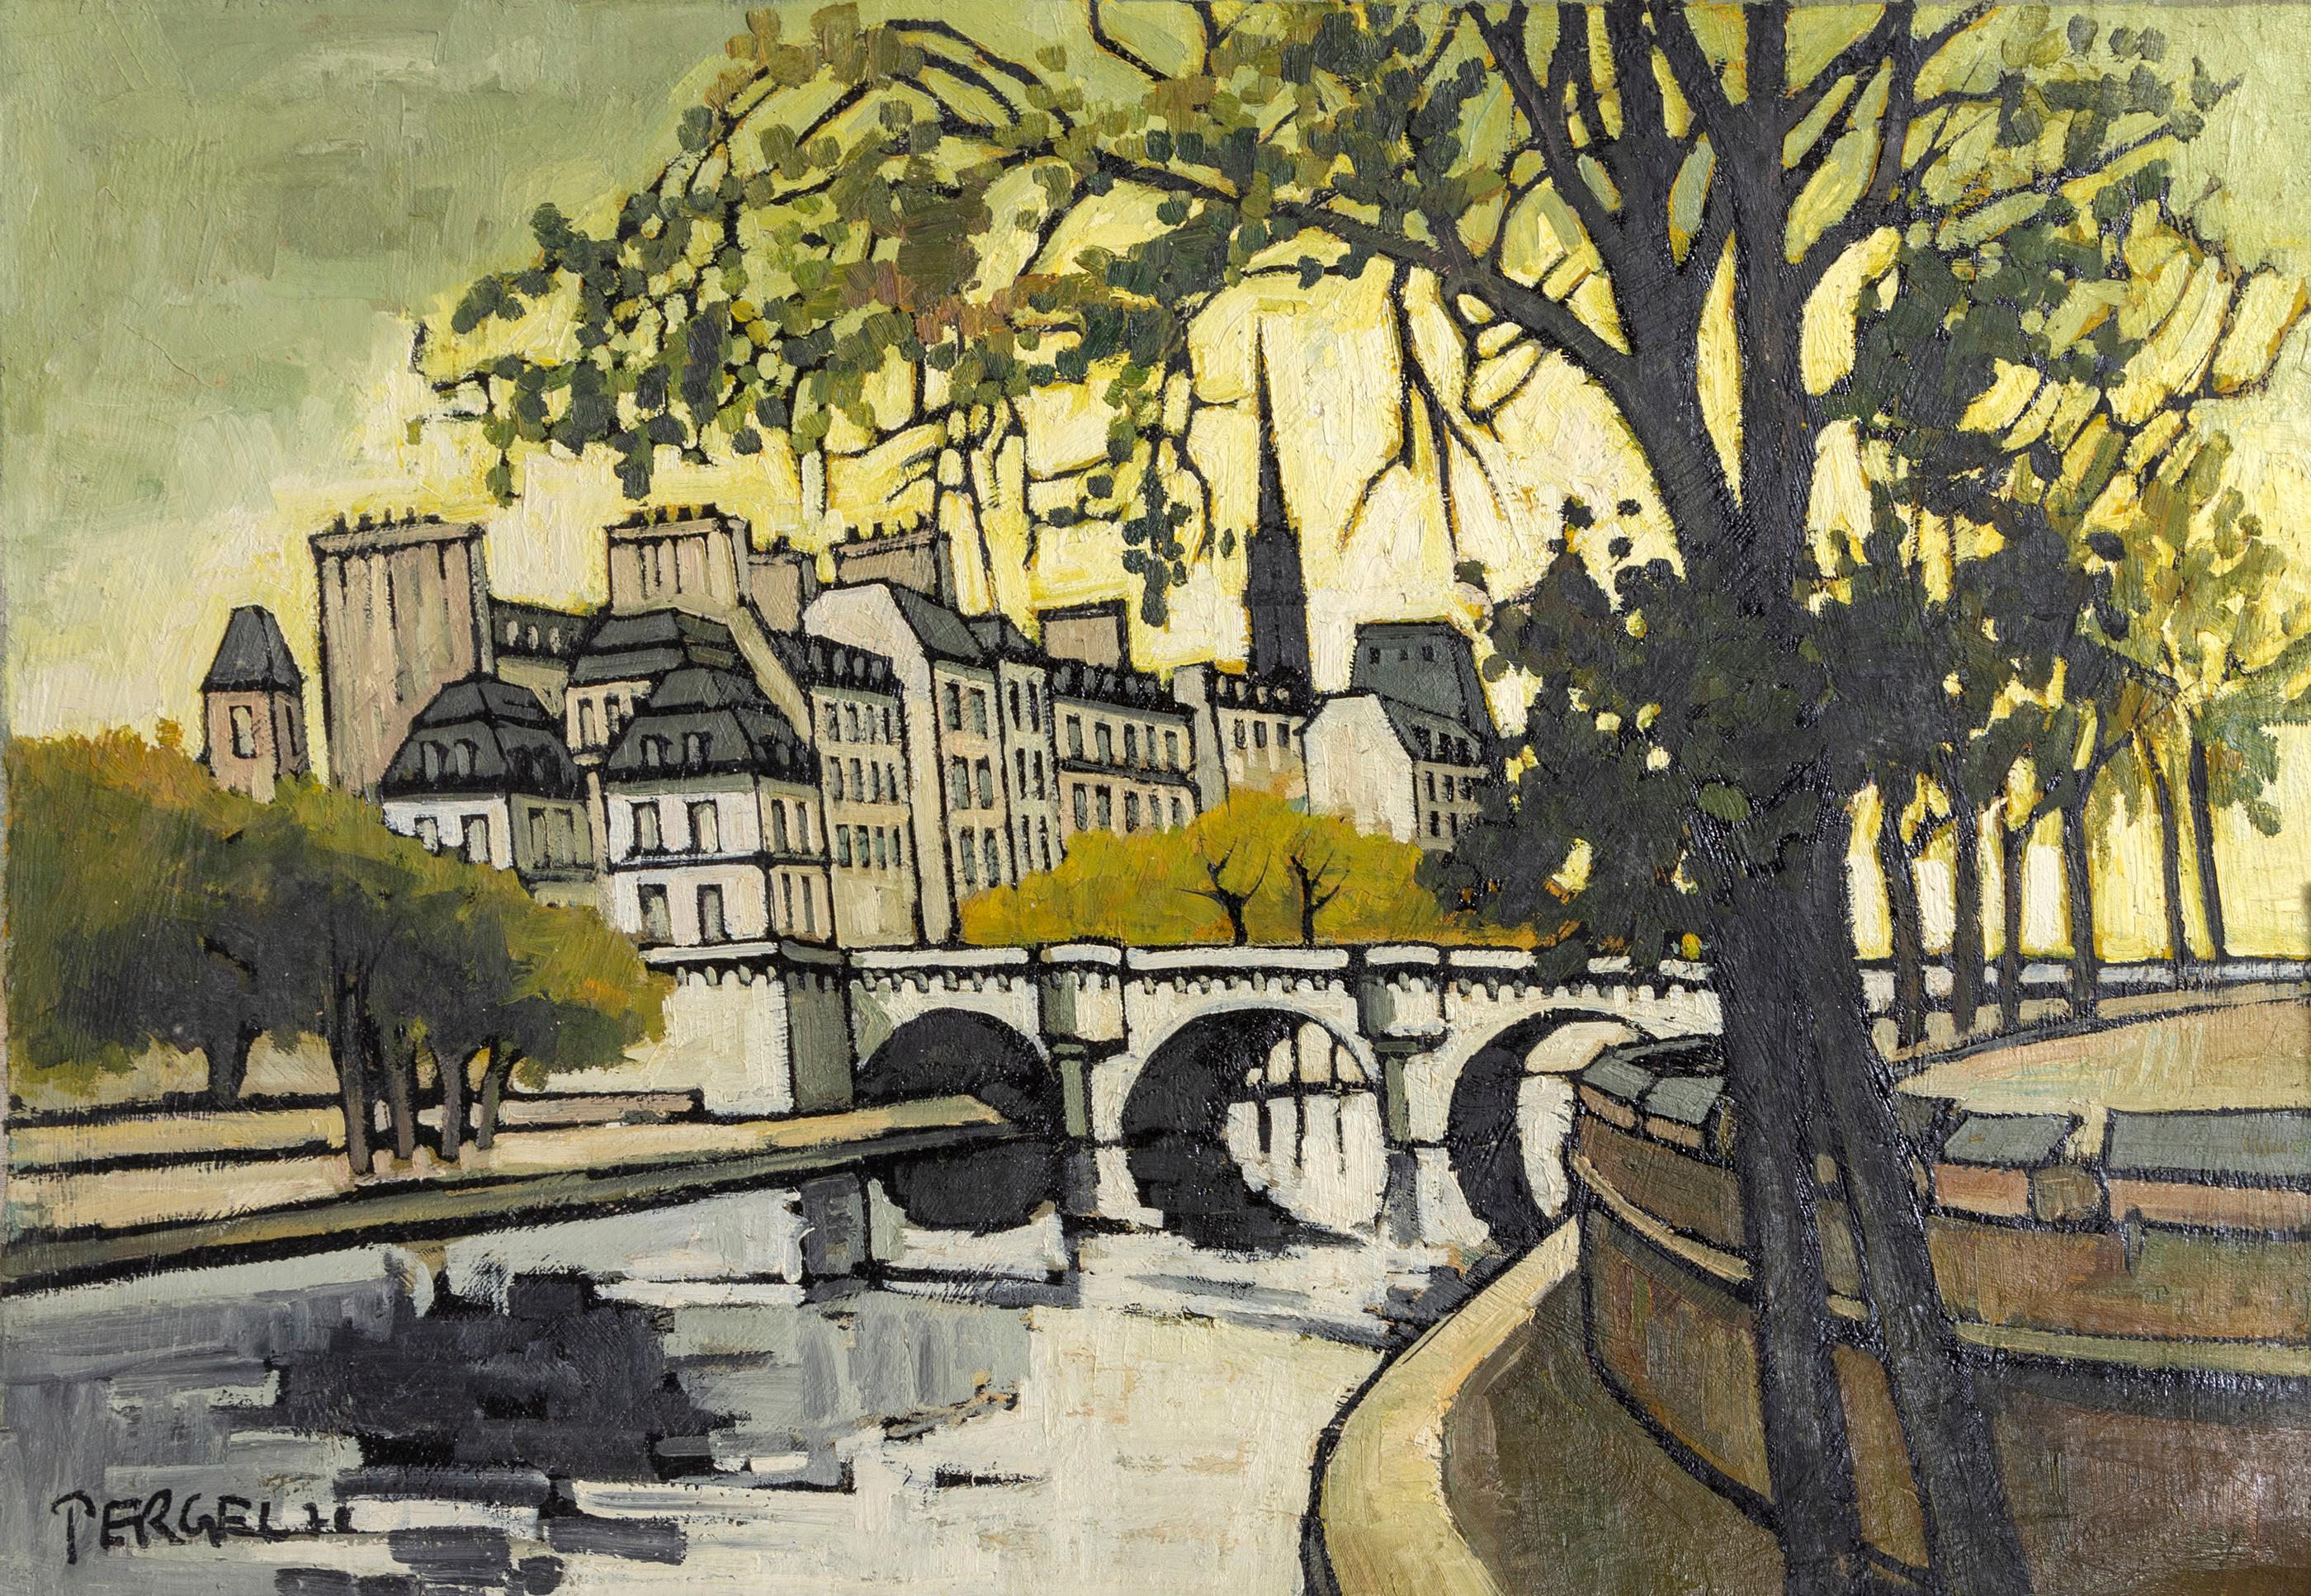 Jacques Pergel, Cityscape 9, Oil Painting